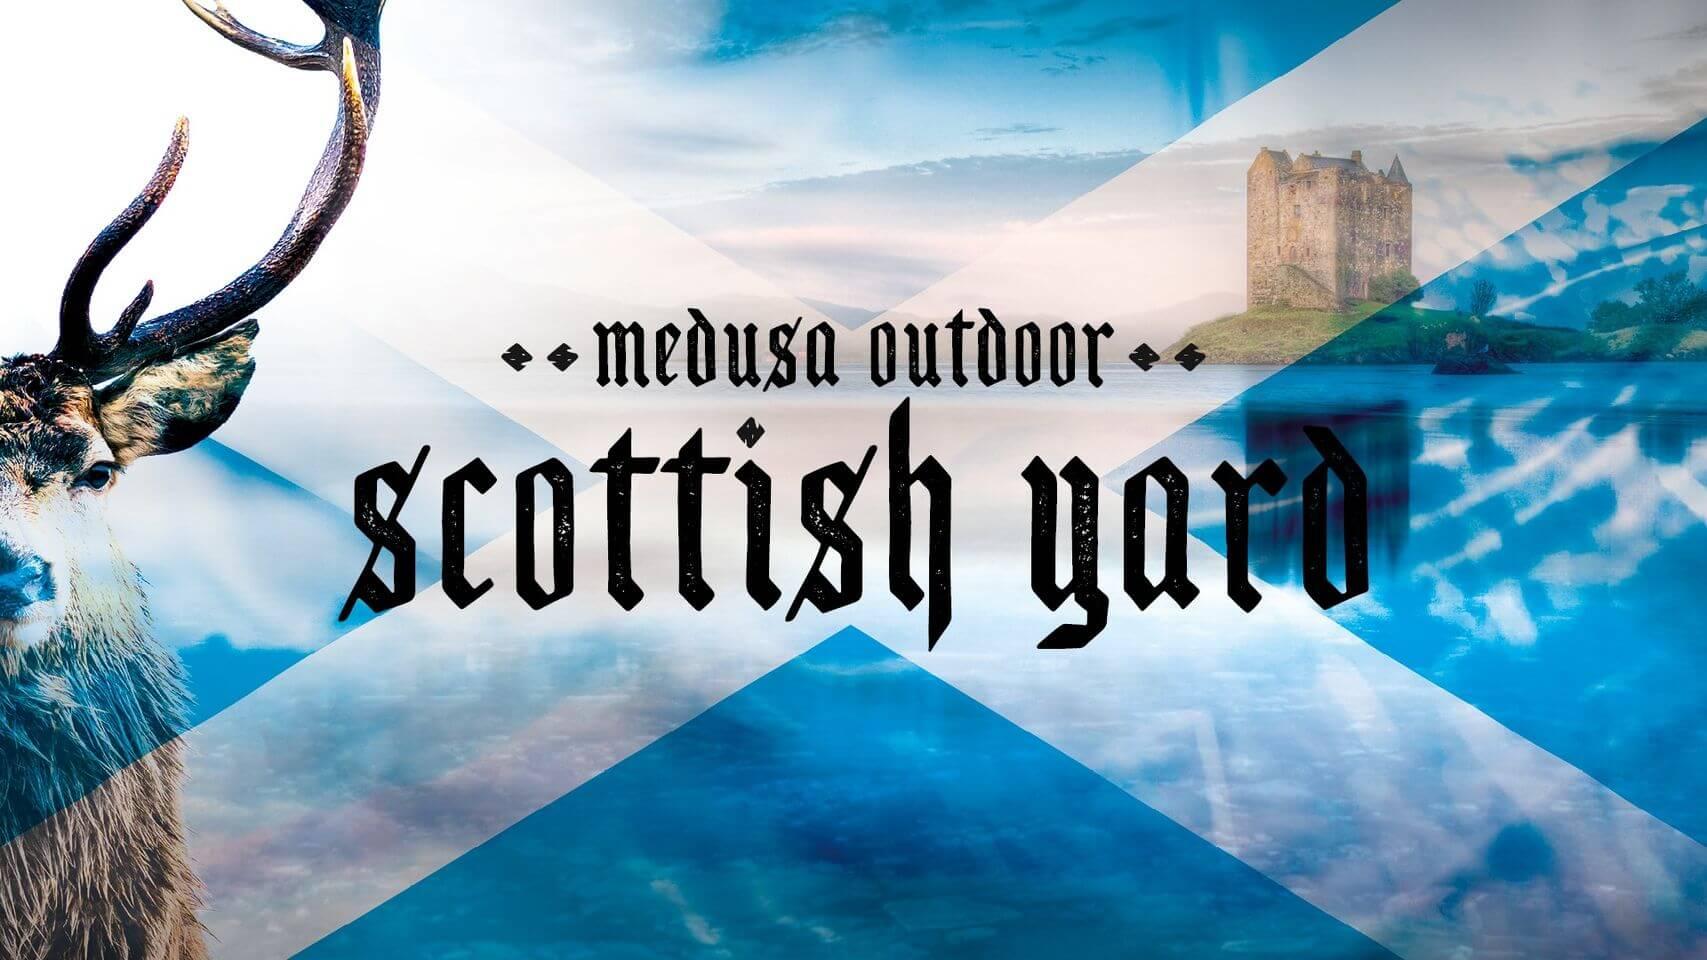 Medusa Outdoor Scottish Yard with Anfisa Letyago